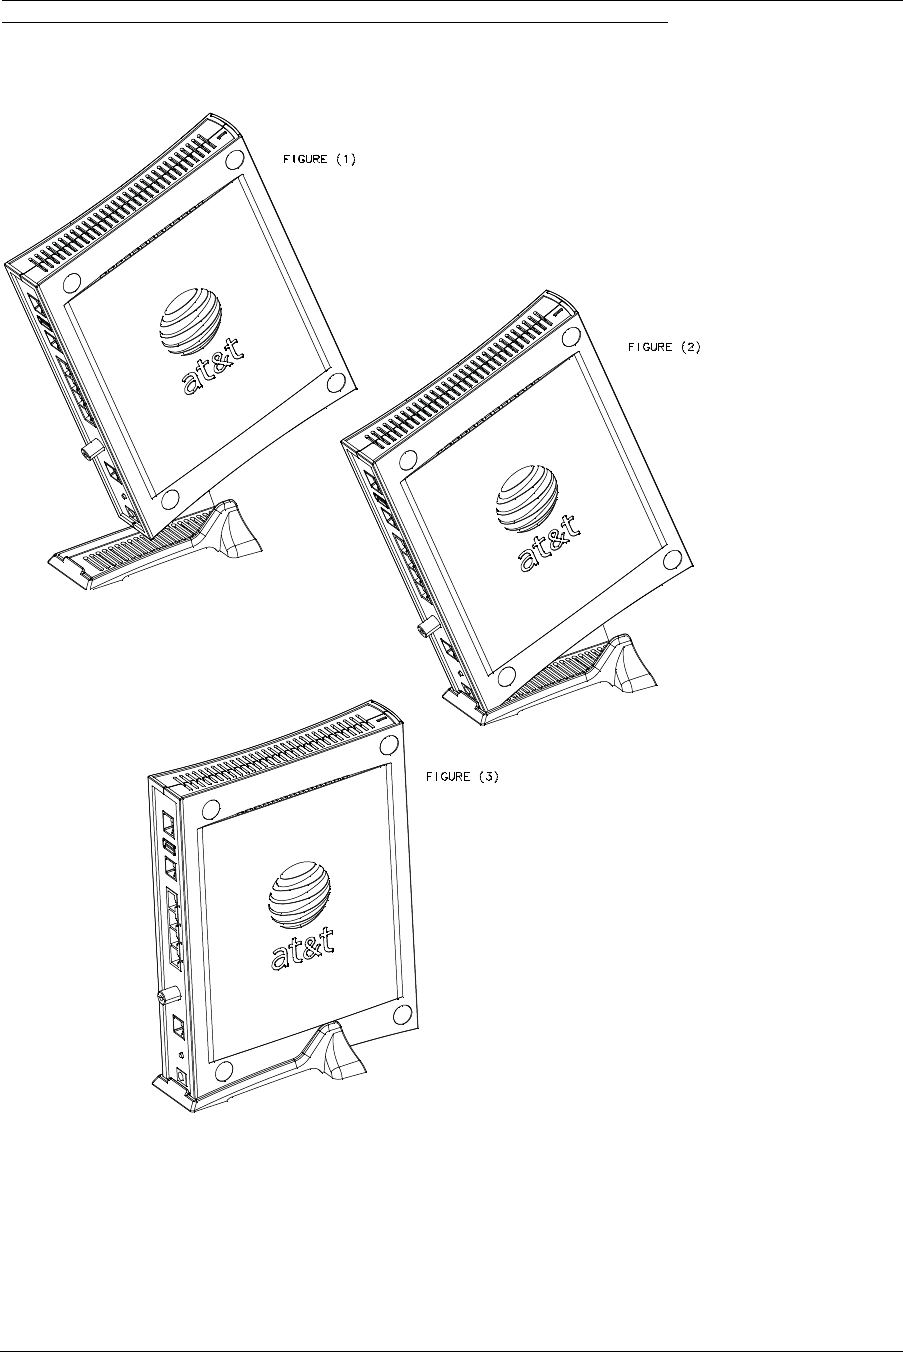 ARRIS NVG589 VDSL Gateway User Manual NVG589 Administrator